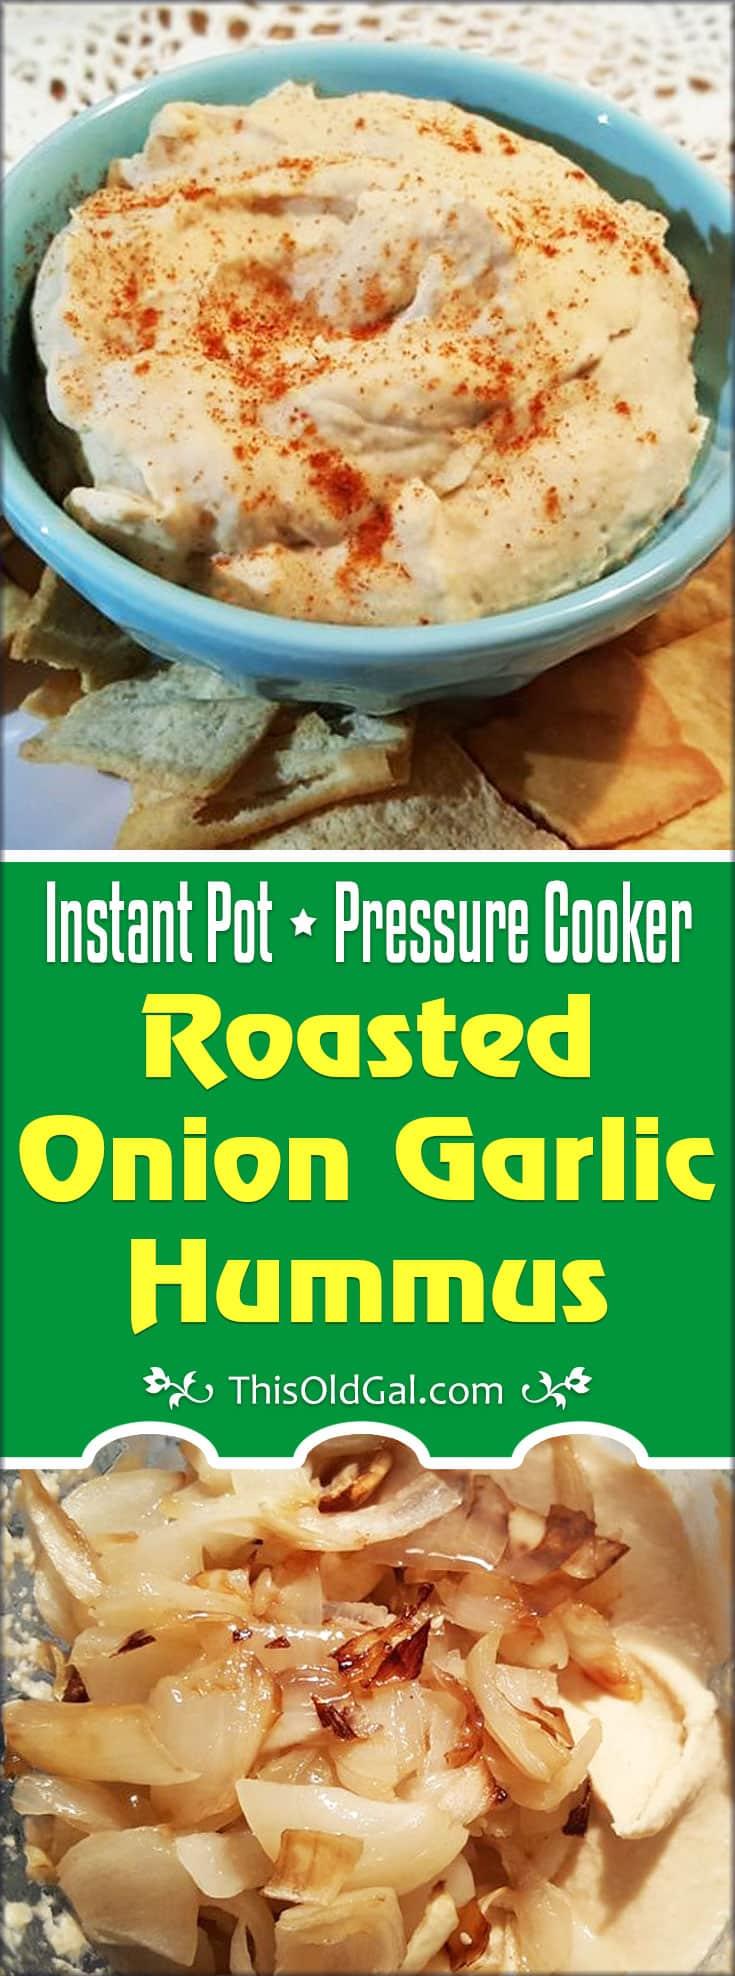 Pressure Cooker Roasted Onion Garlic Hummus